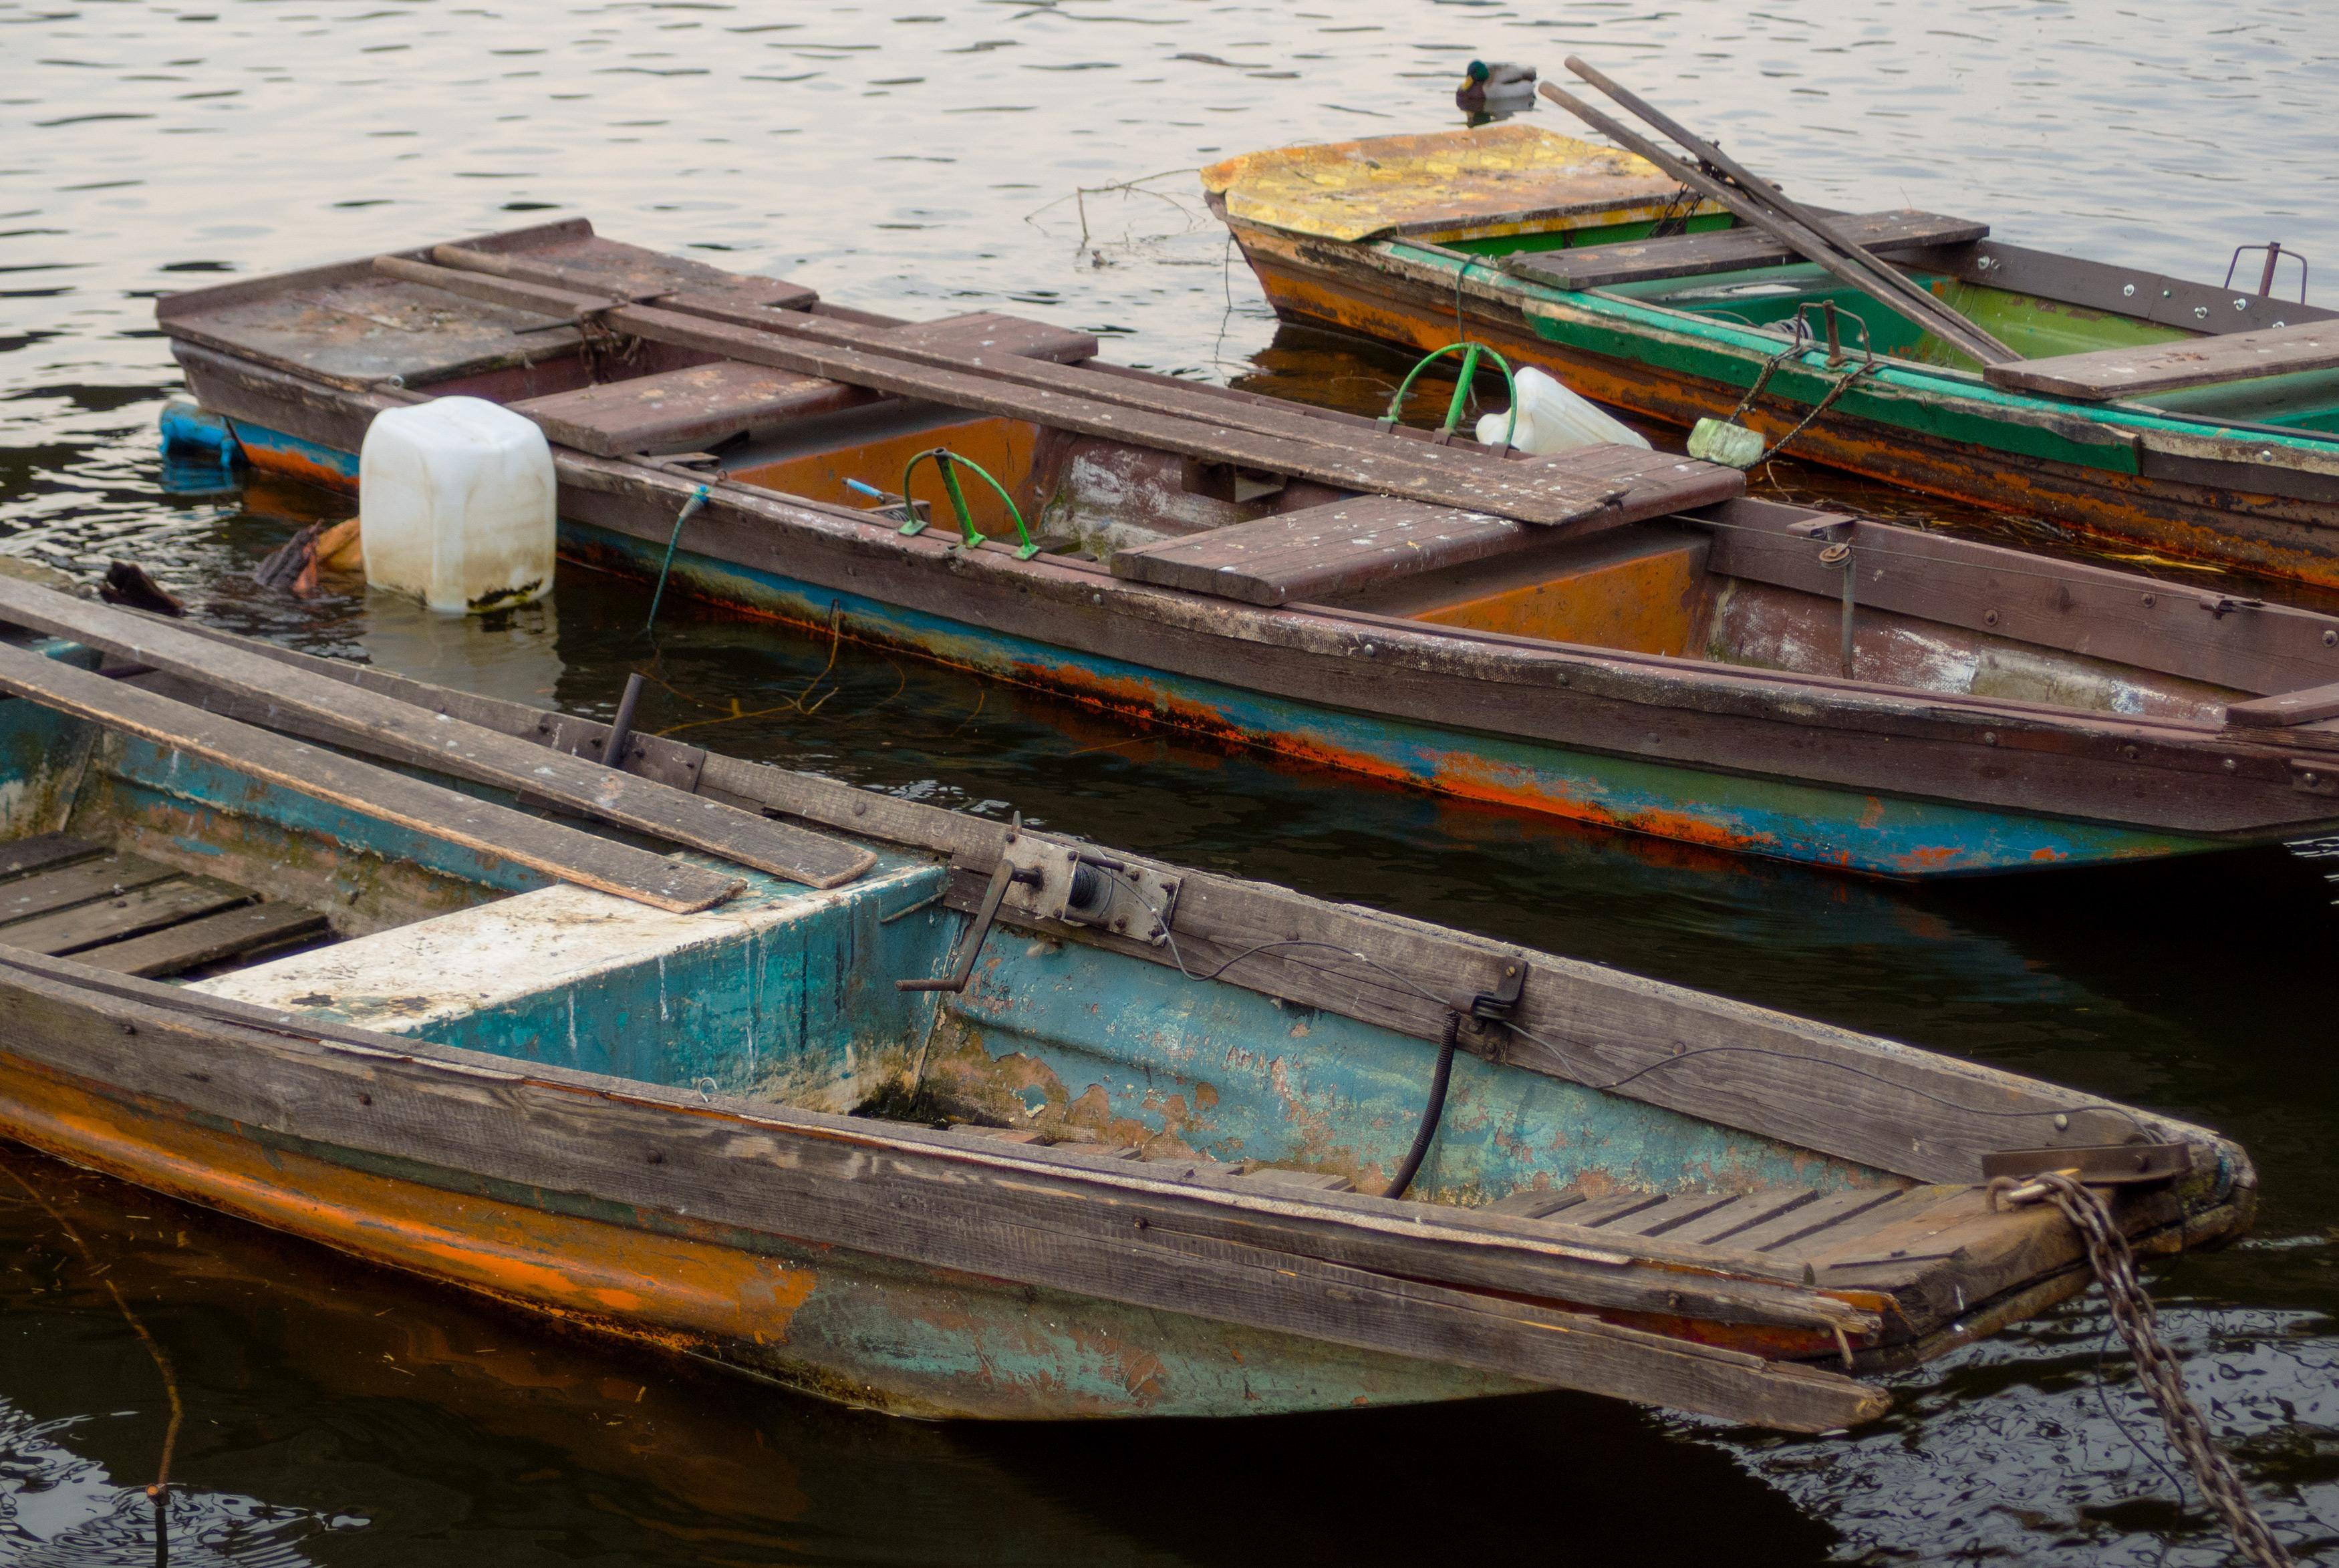 Free Image: Old Wooden Boats | Libreshot Public Domain Photos